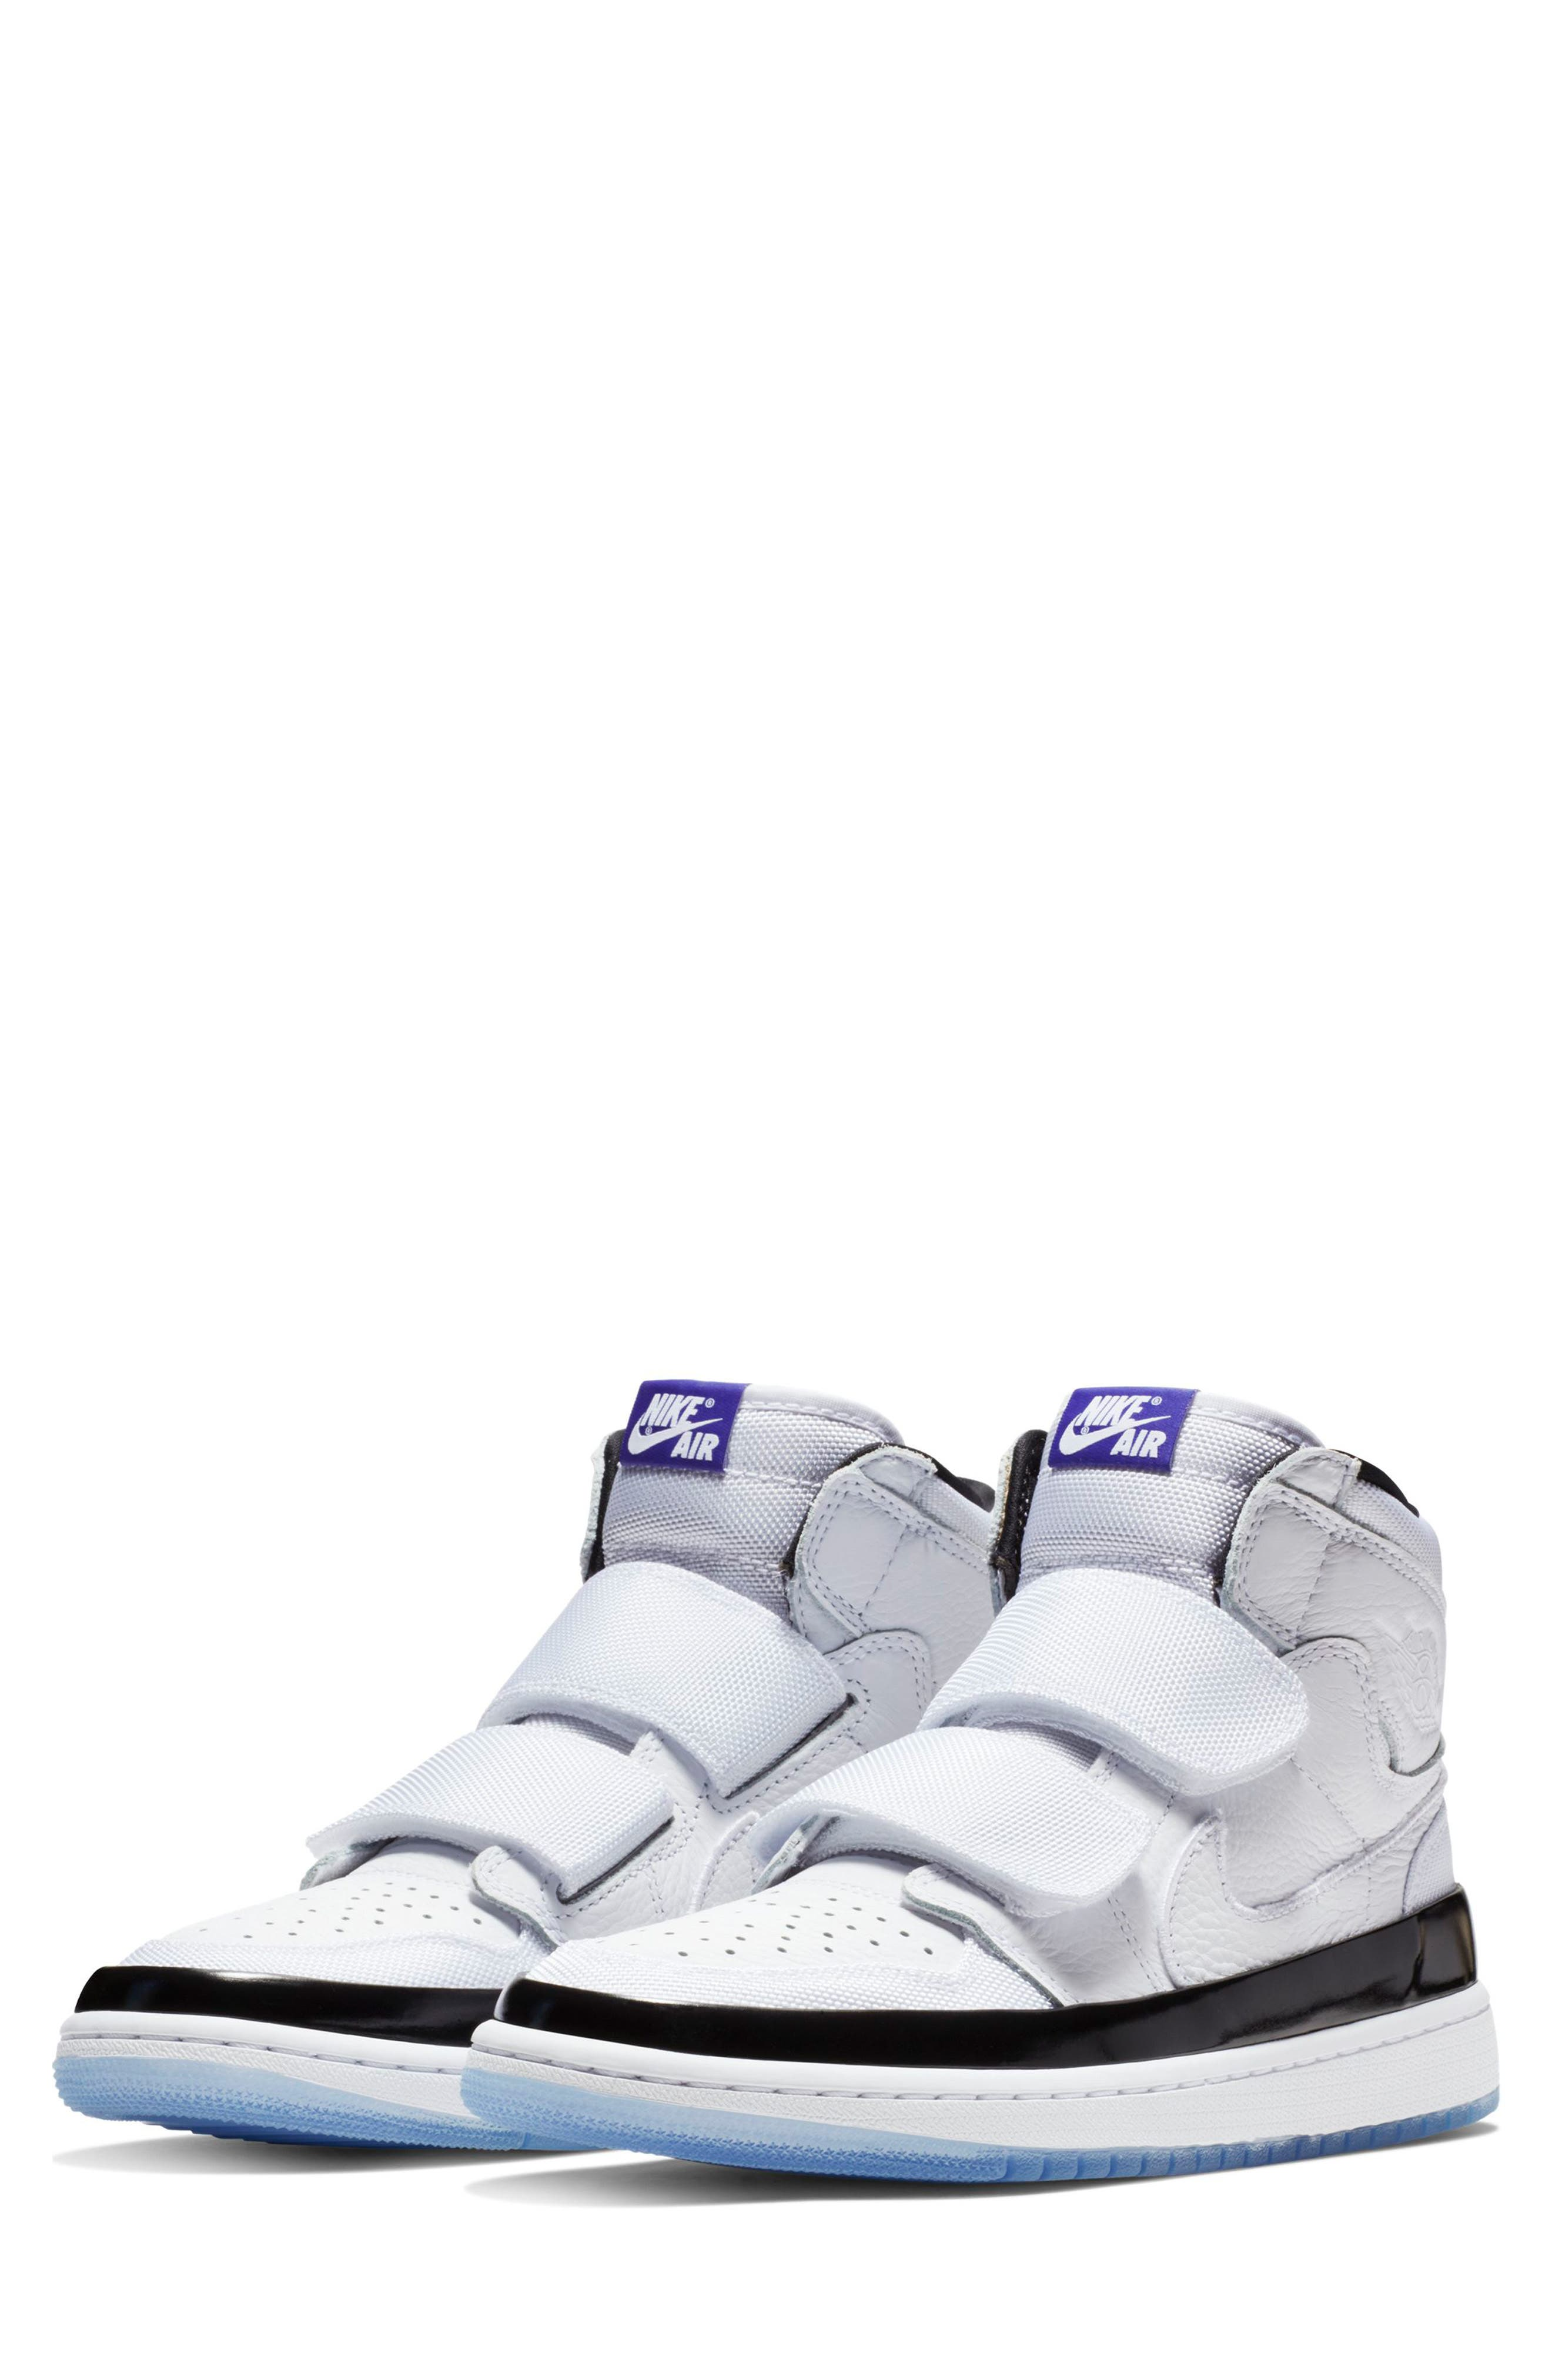 huge discount 07234 10177 ... greece nike air jordan 1 retro high double strap sneaker men 365d4 1de38